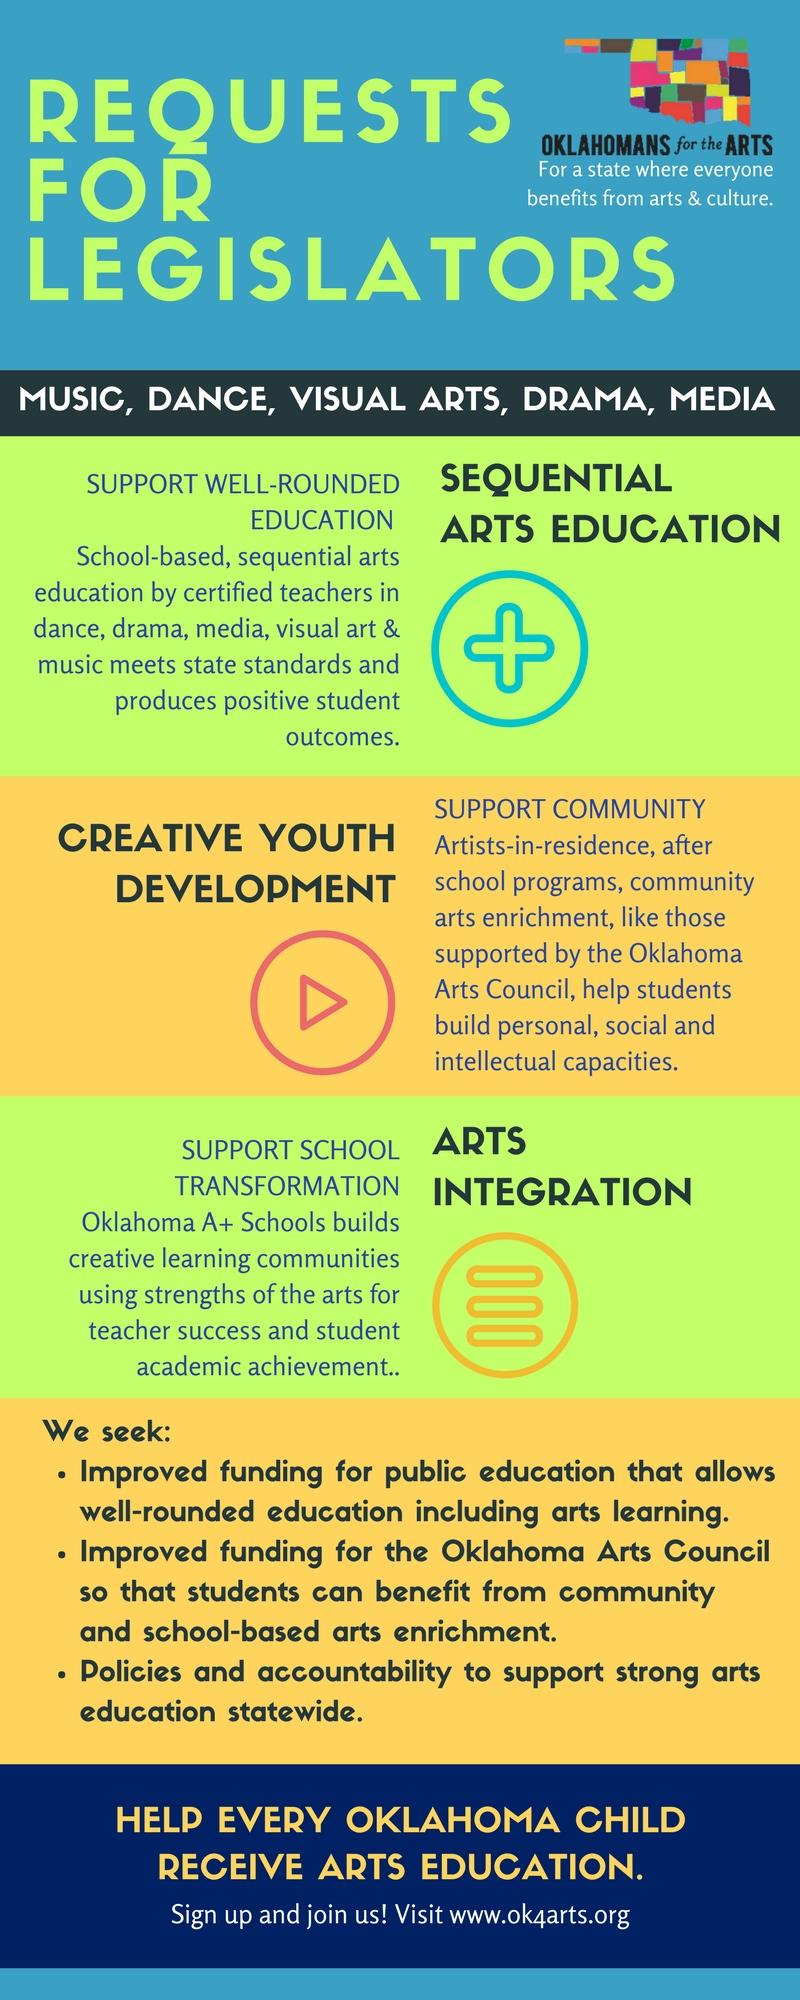 2018-OFTA-Arts-Education-LegAsks.jpg